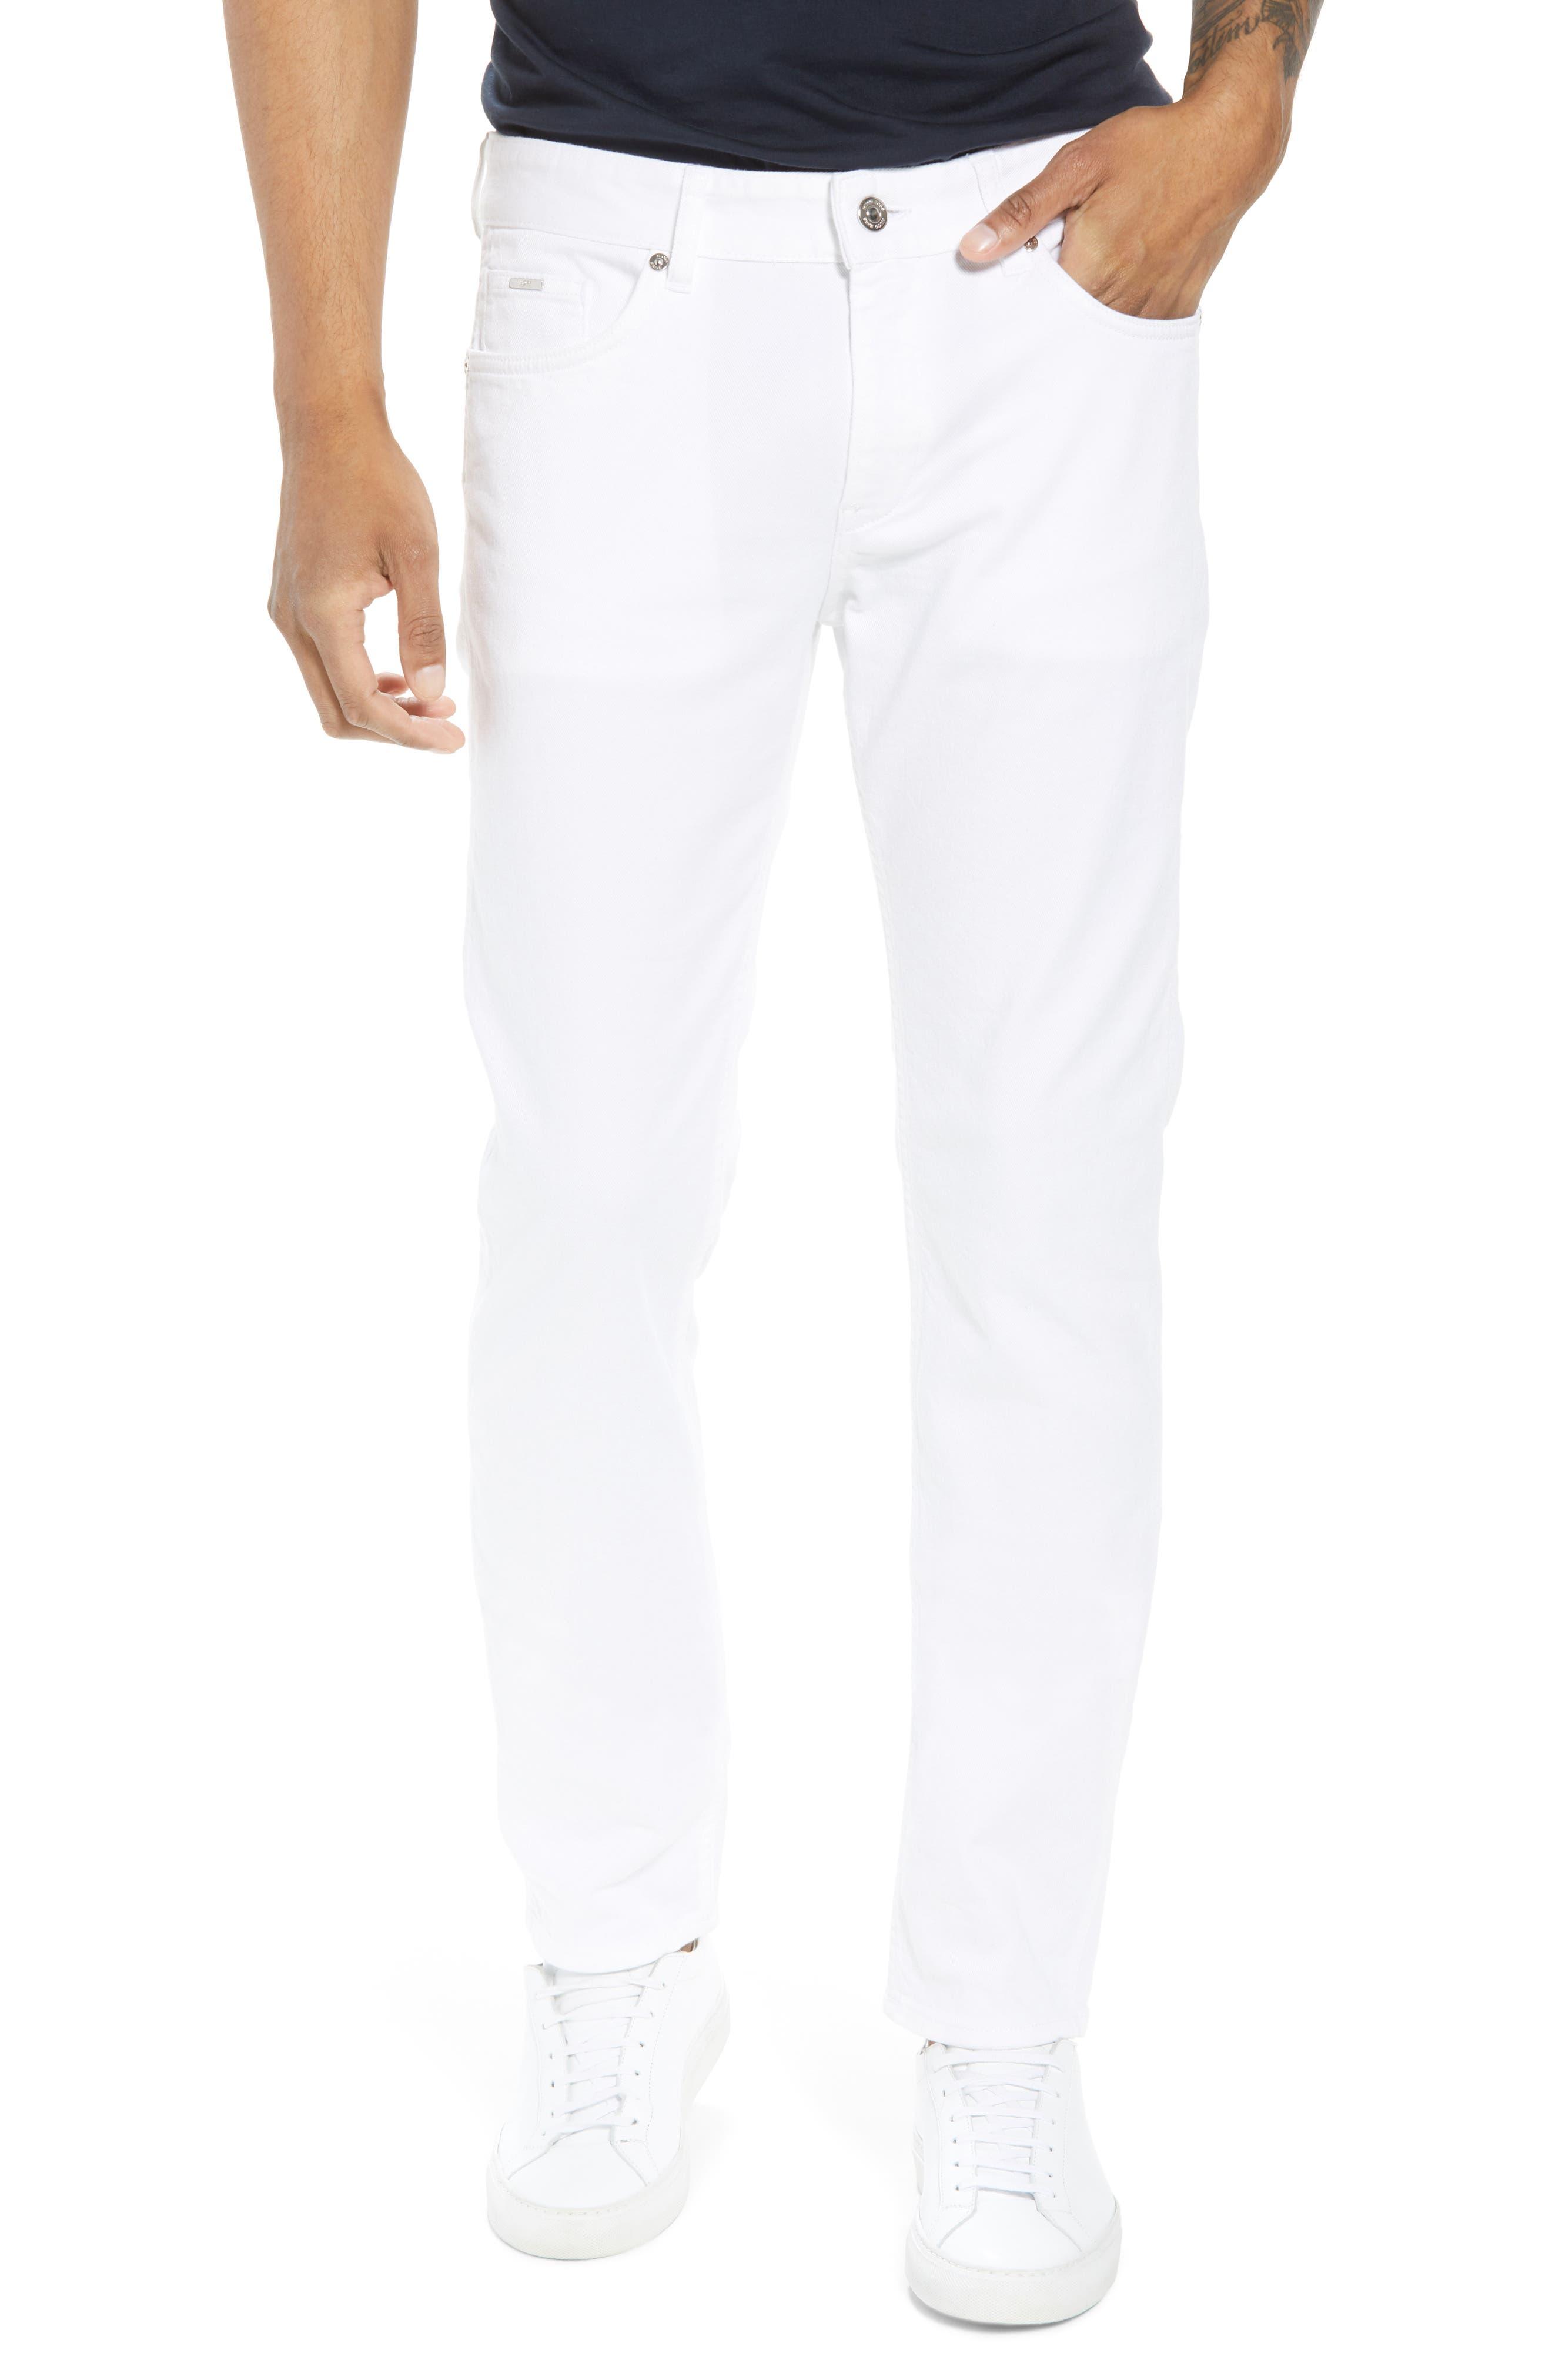 Delaware Slim Fit Jeans,                             Main thumbnail 1, color,                             White